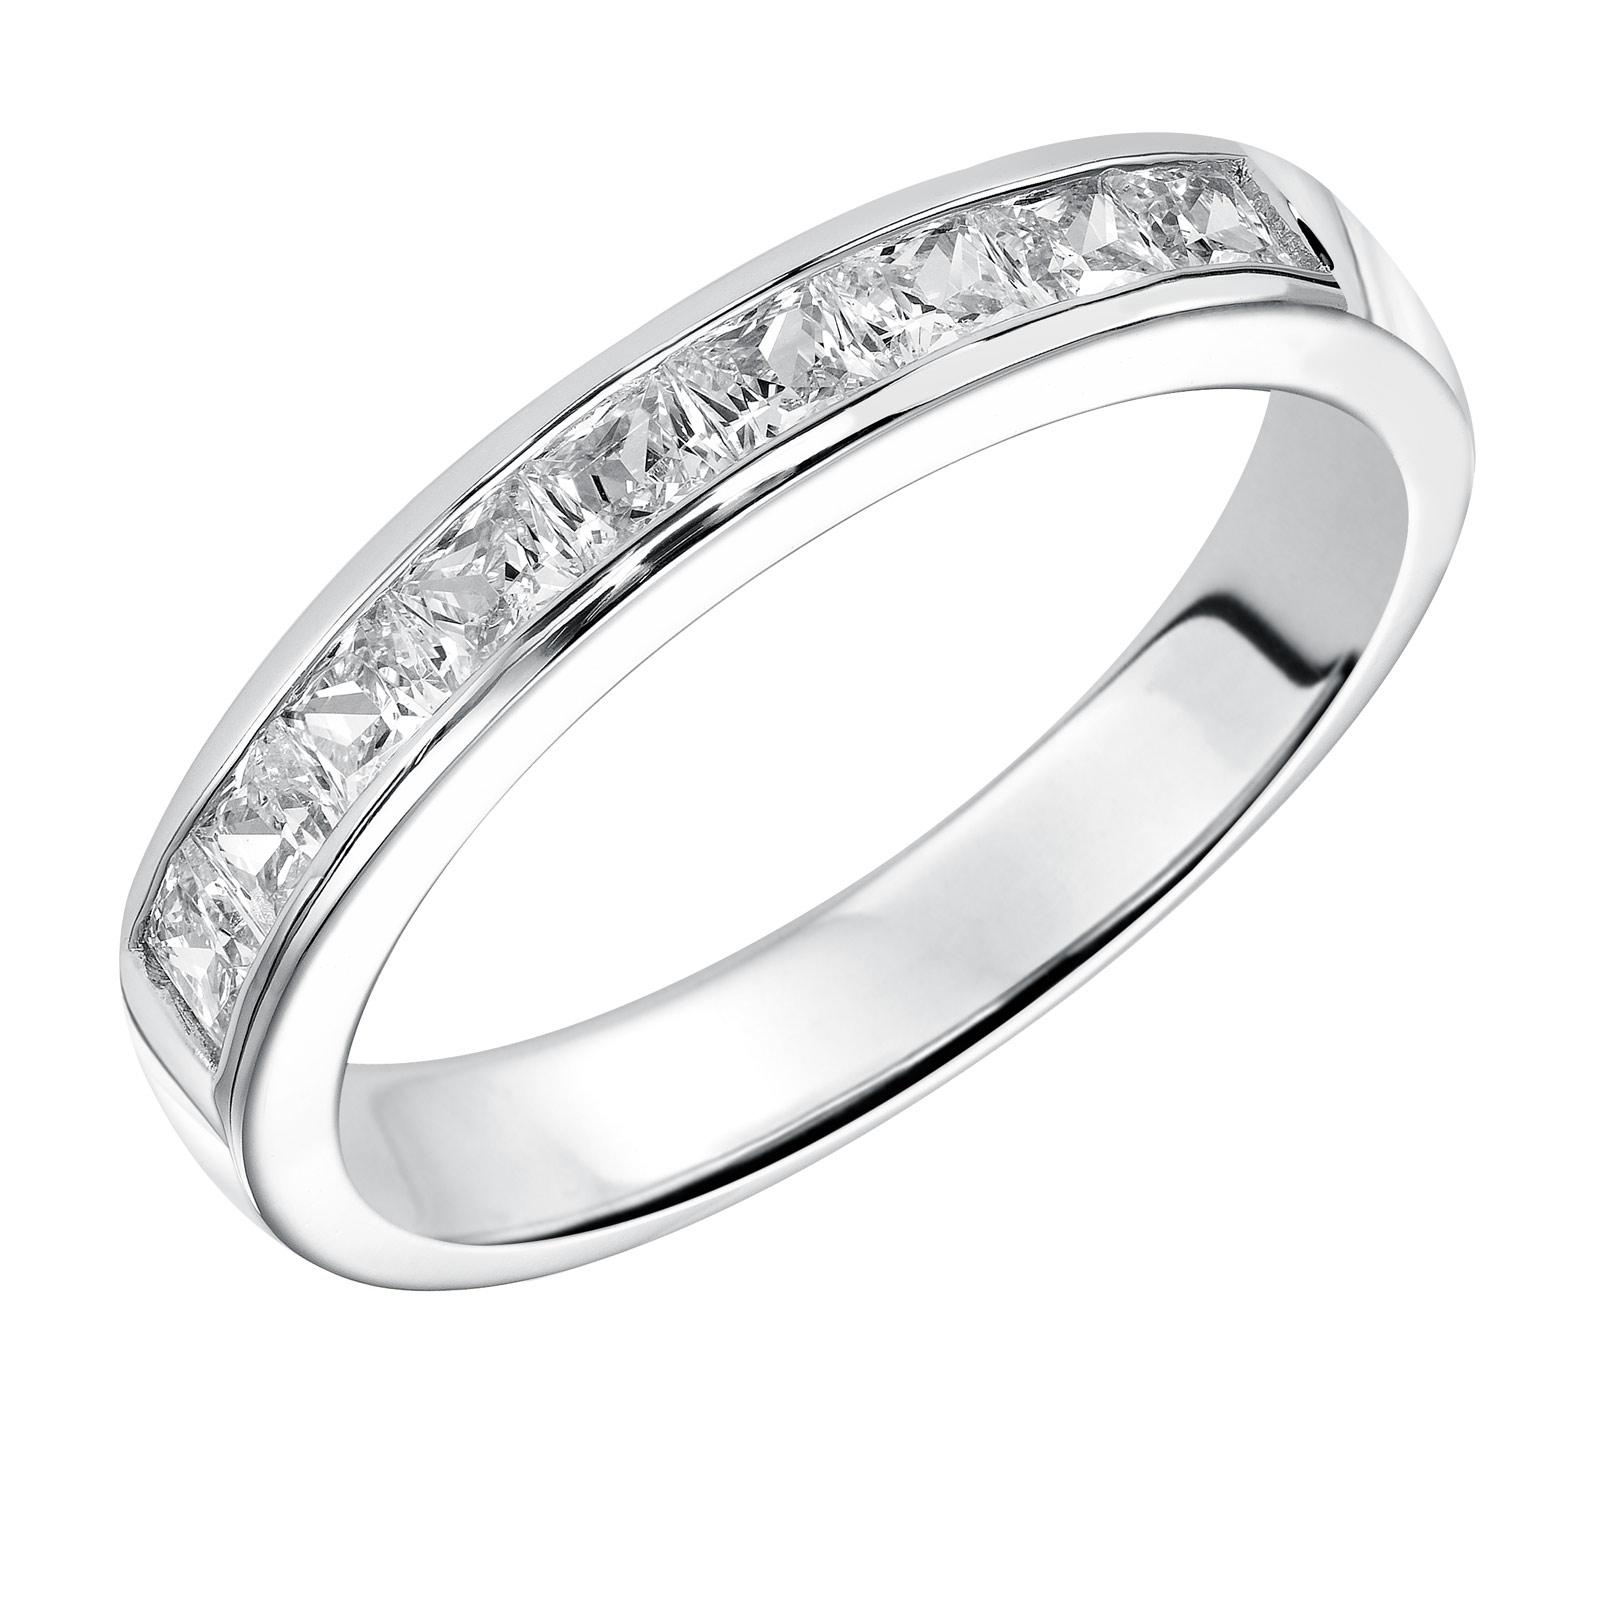 Goldman ring 33 60e4w l00 long island ny goldman for Long island wedding bands